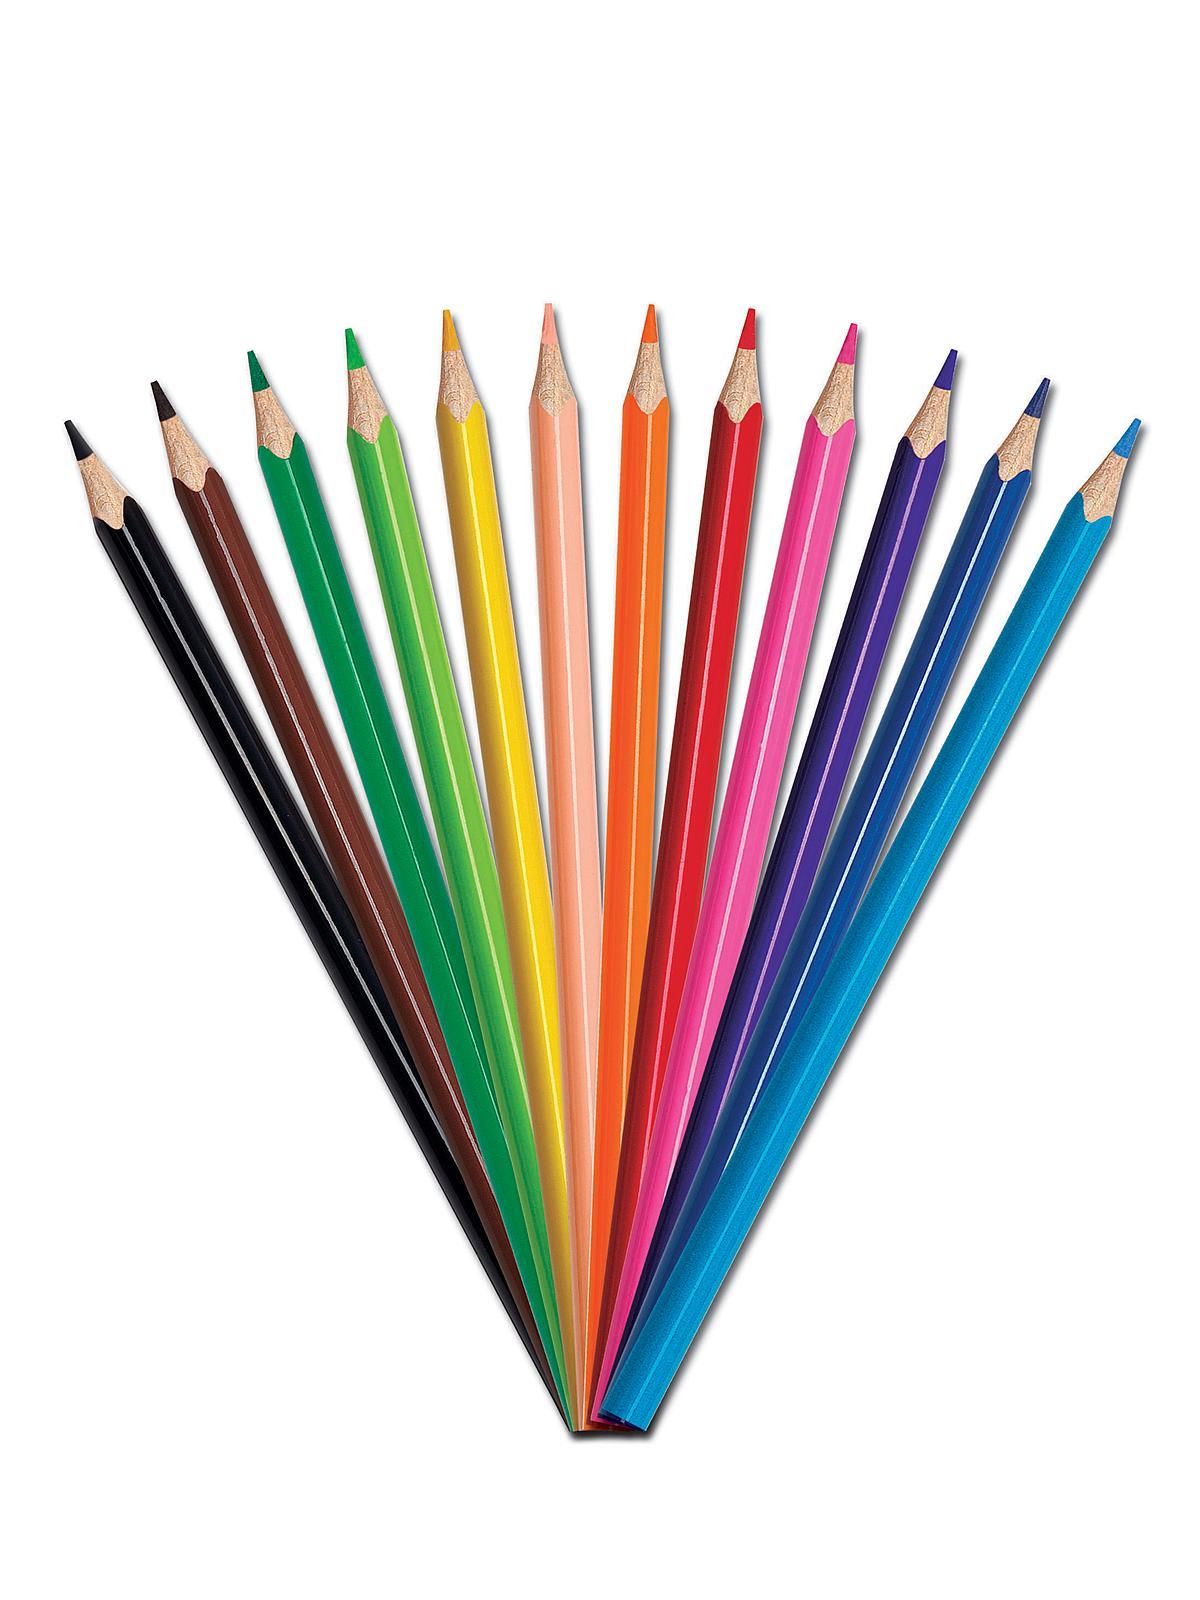 Maped - Triangular Colored Pencil Sets